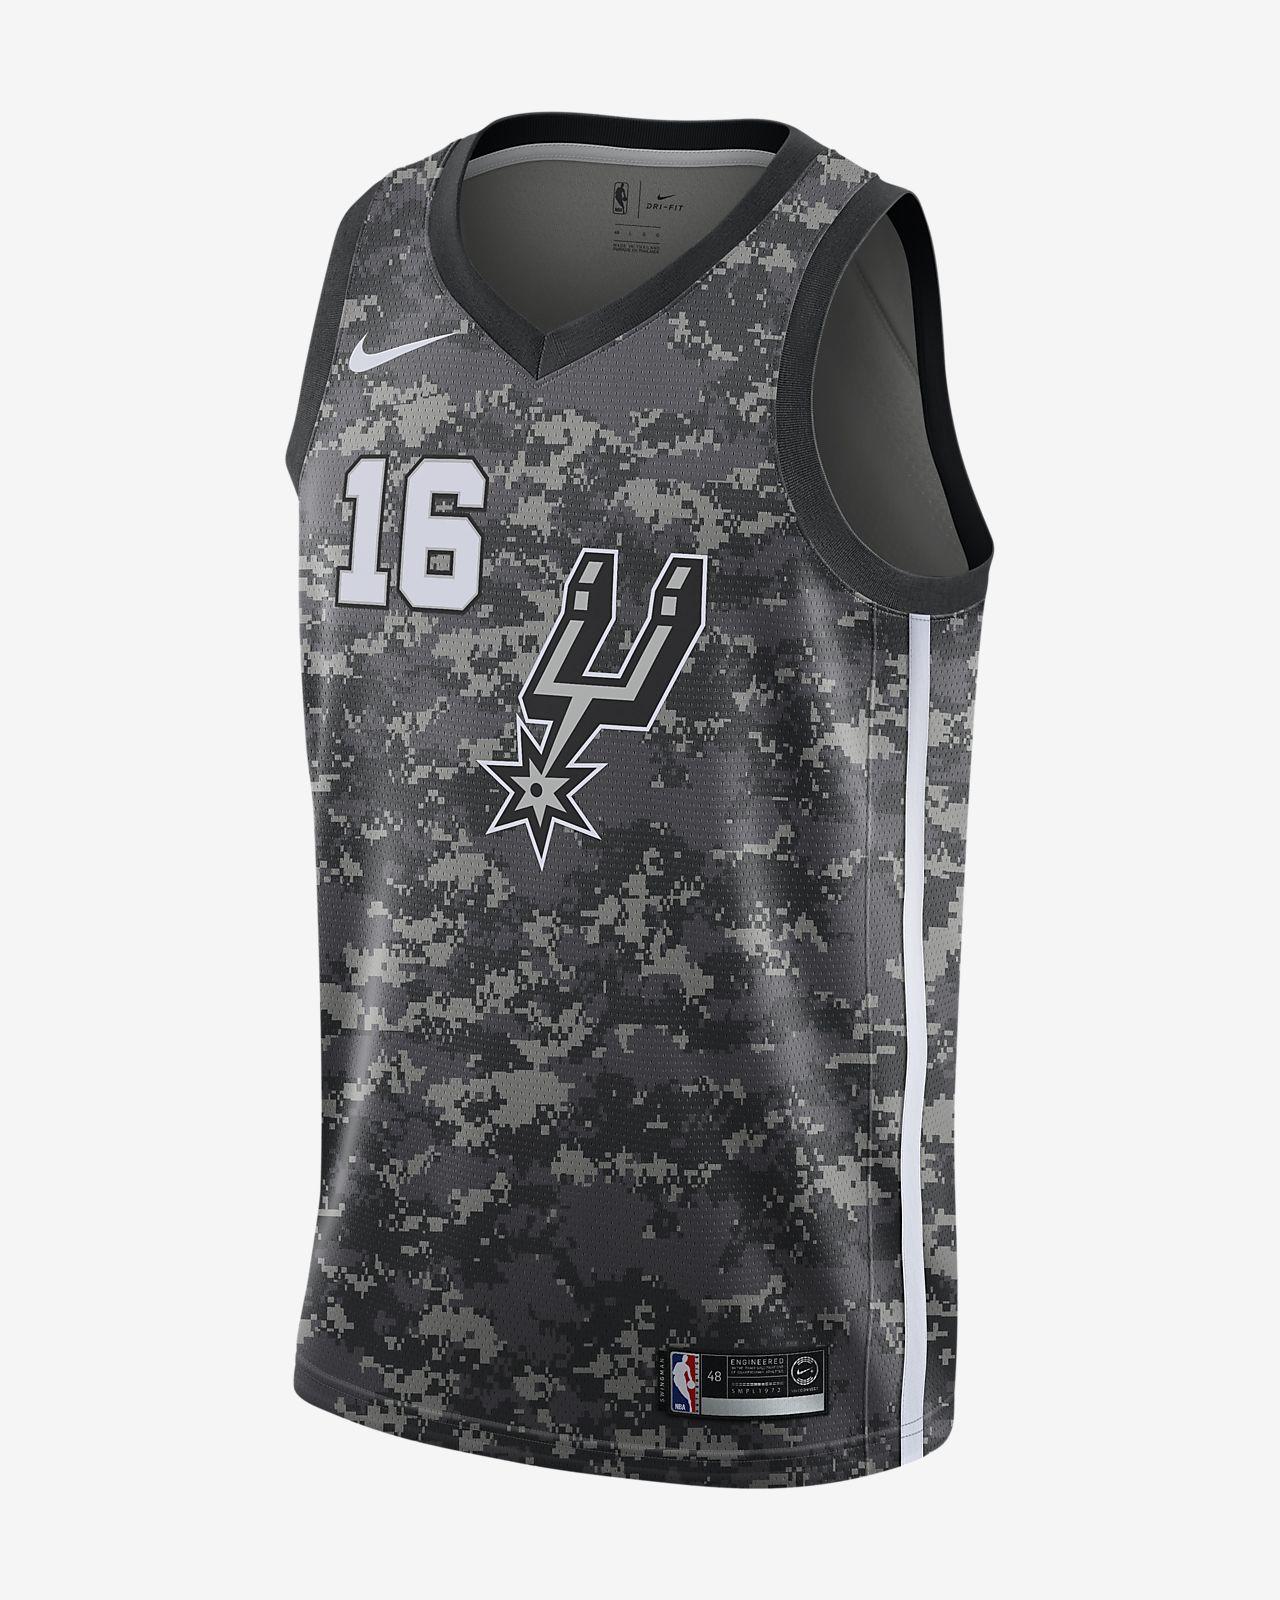 7134d7748f8 Pau Gasol City Edition Swingman Jersey (San Antonio Spurs) Men's ...